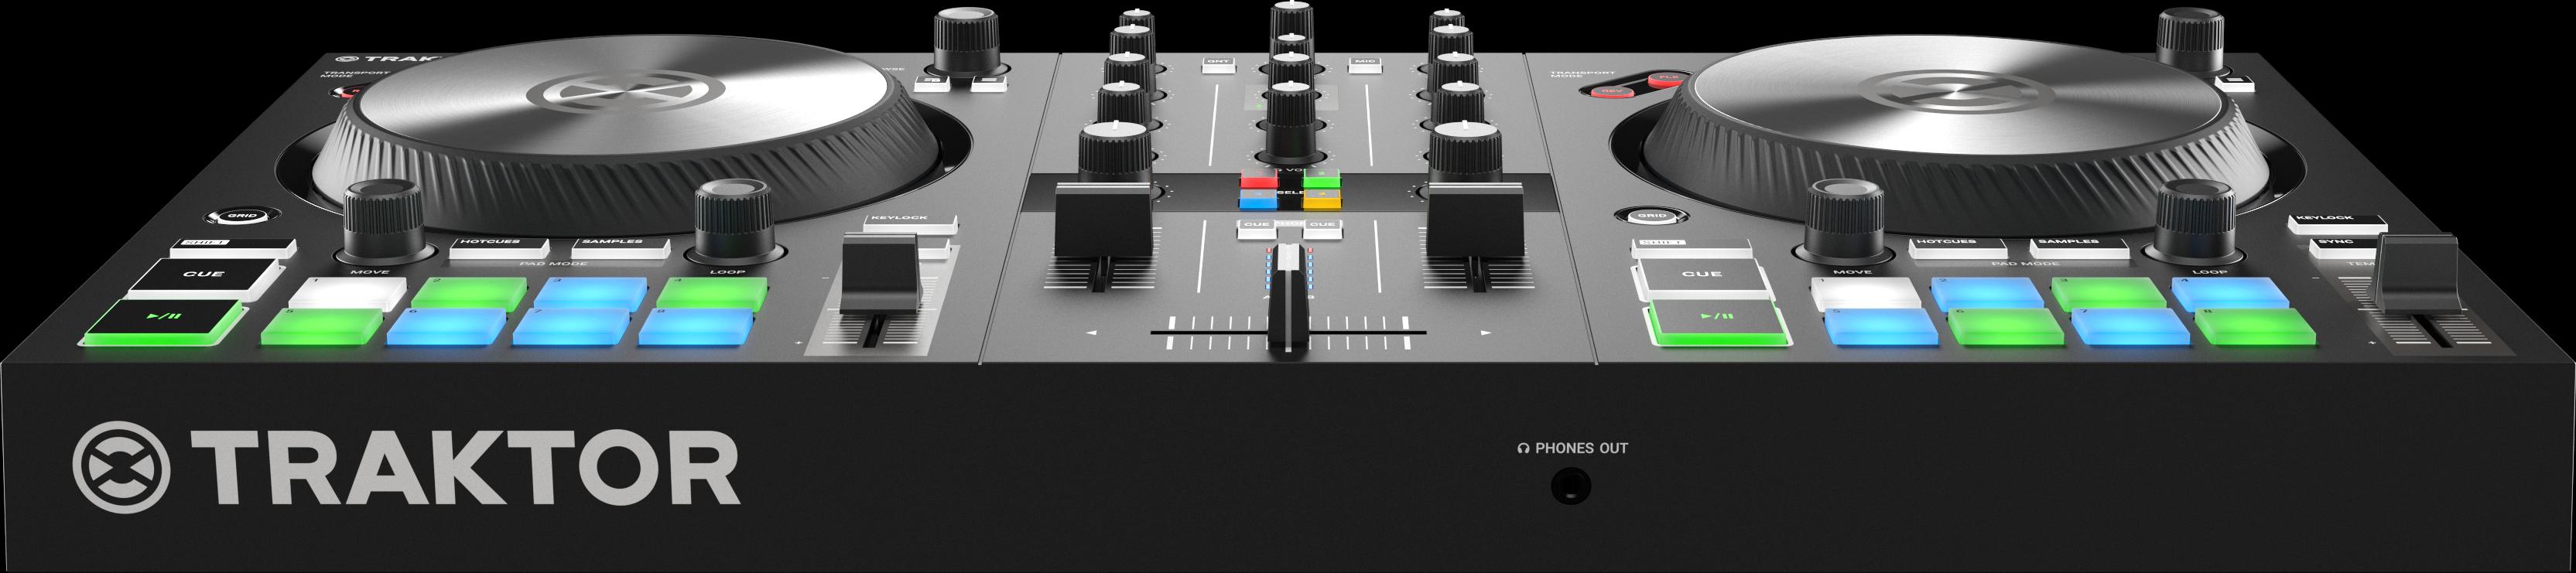 Test: Traktor Kontrol S2 MK3 - DJ LAB